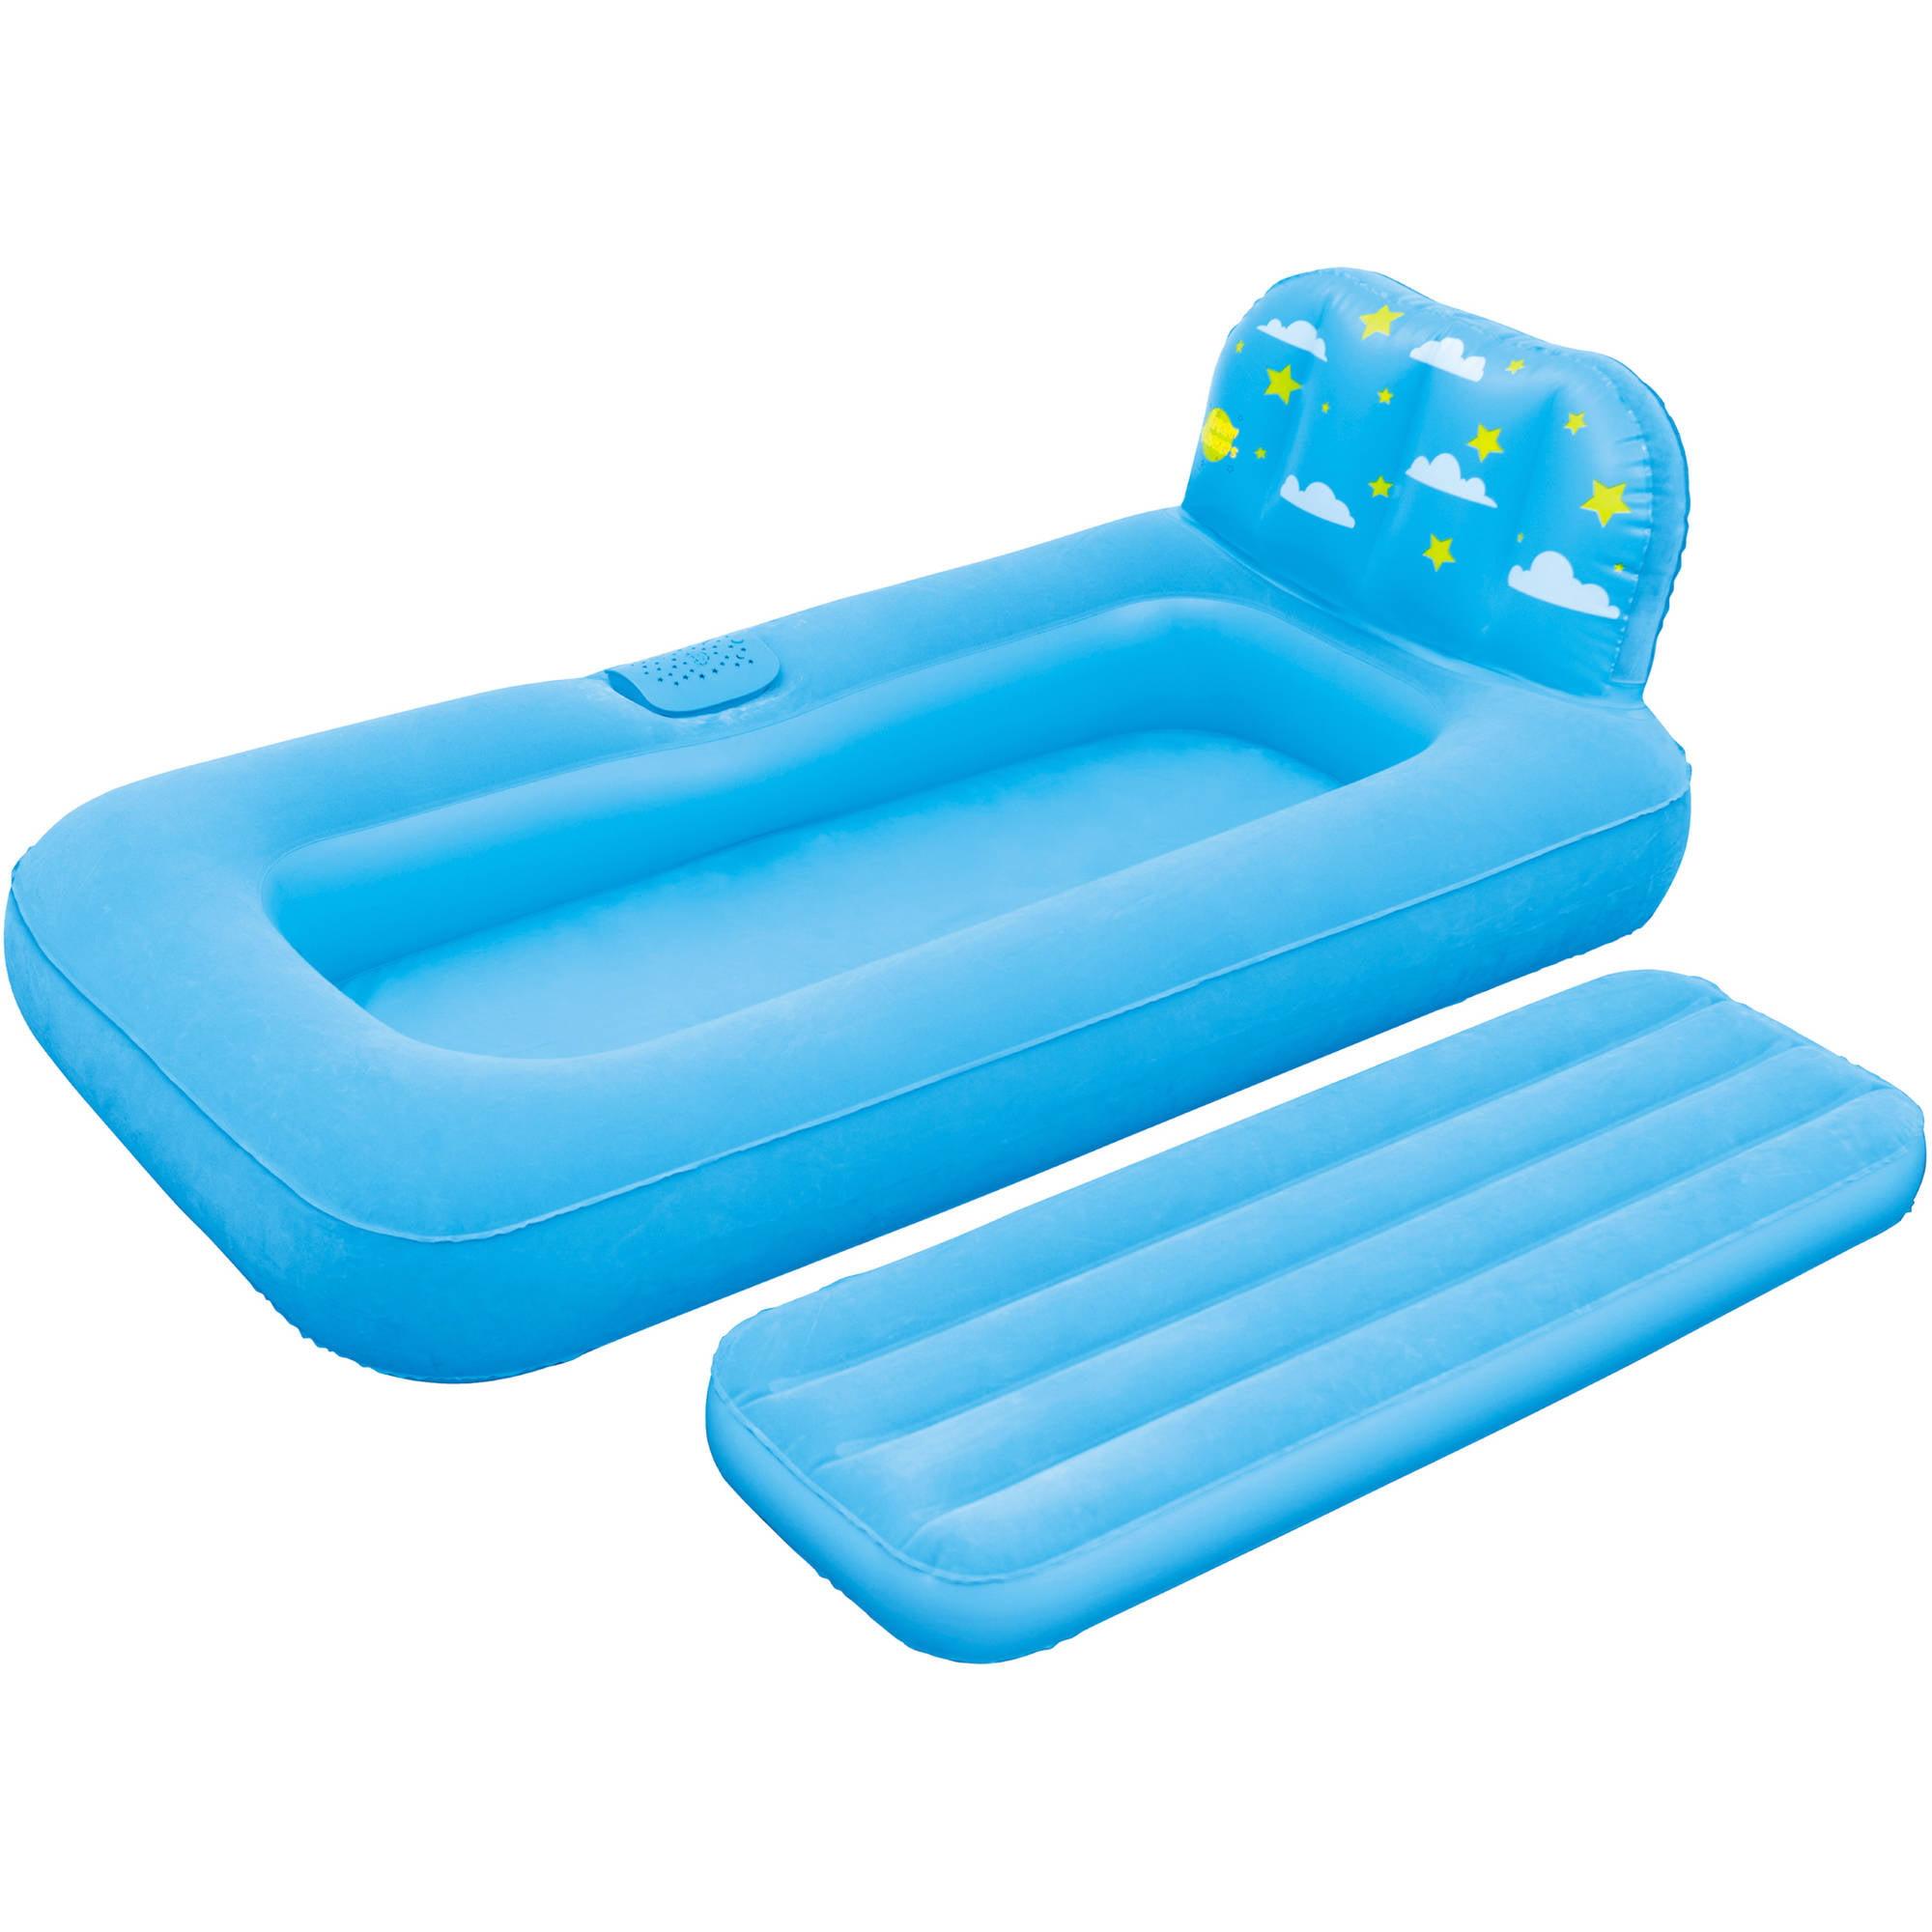 Inflatable bed for kids - Inflatable Bed For Kids